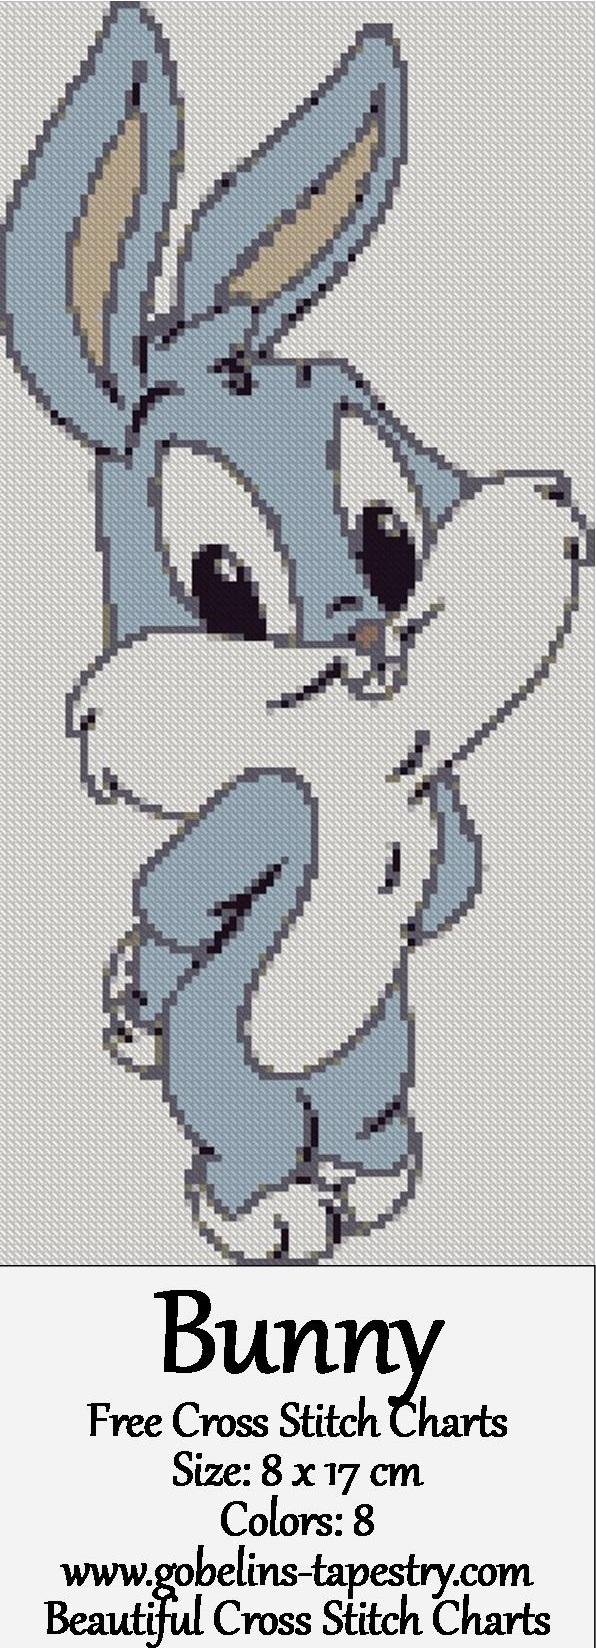 Bunny – Free Cross Stitch Charts